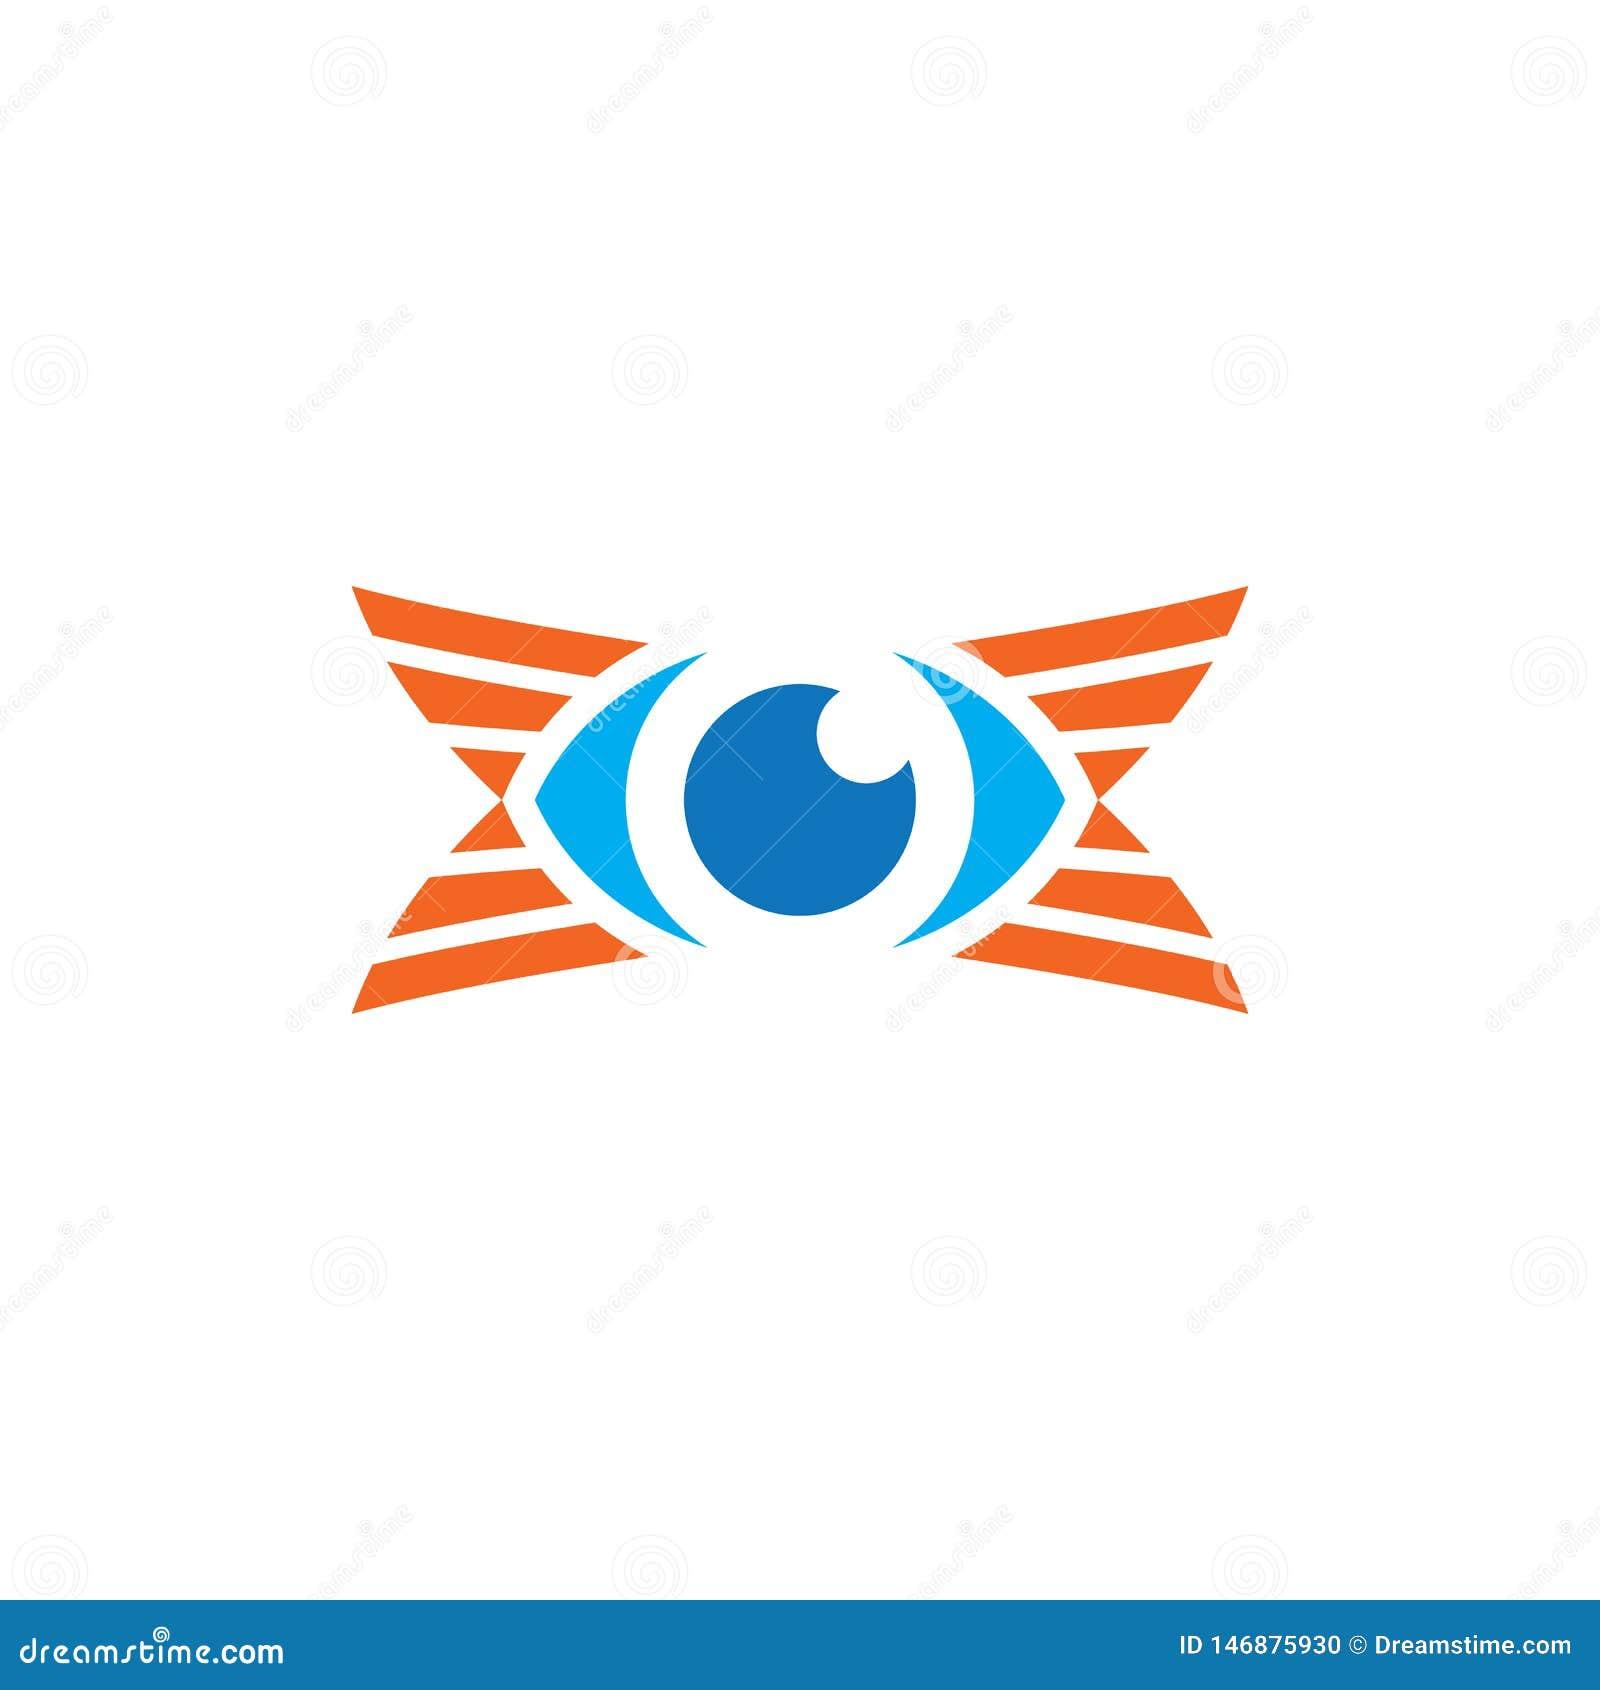 Eye optic logo business Design